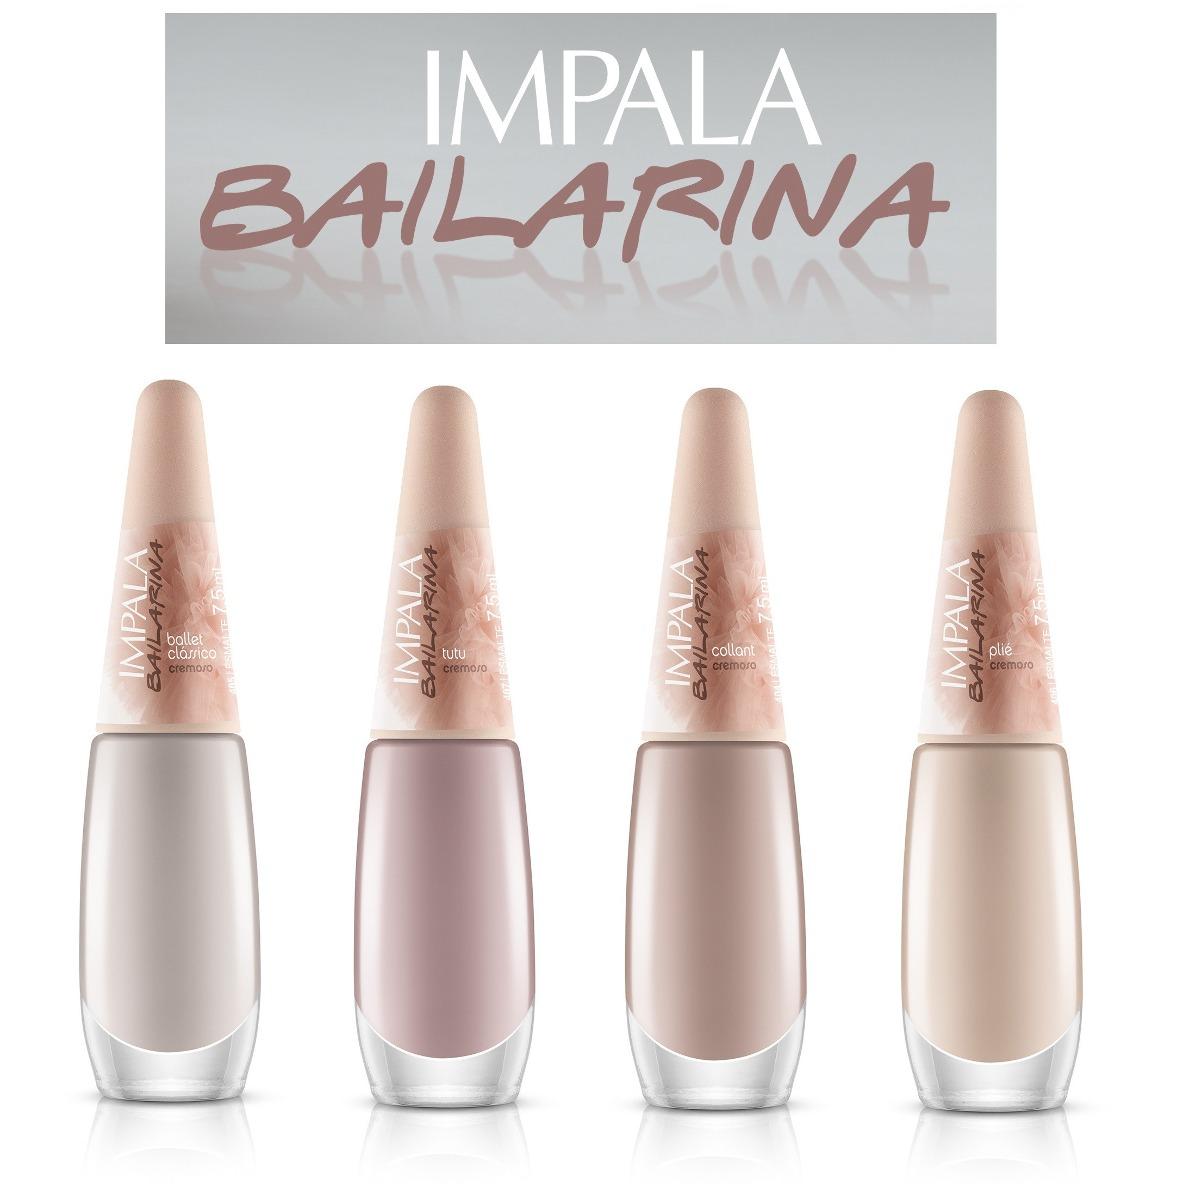 4347cb8957 Esmalte Impala Bailarina 4 Cores 7